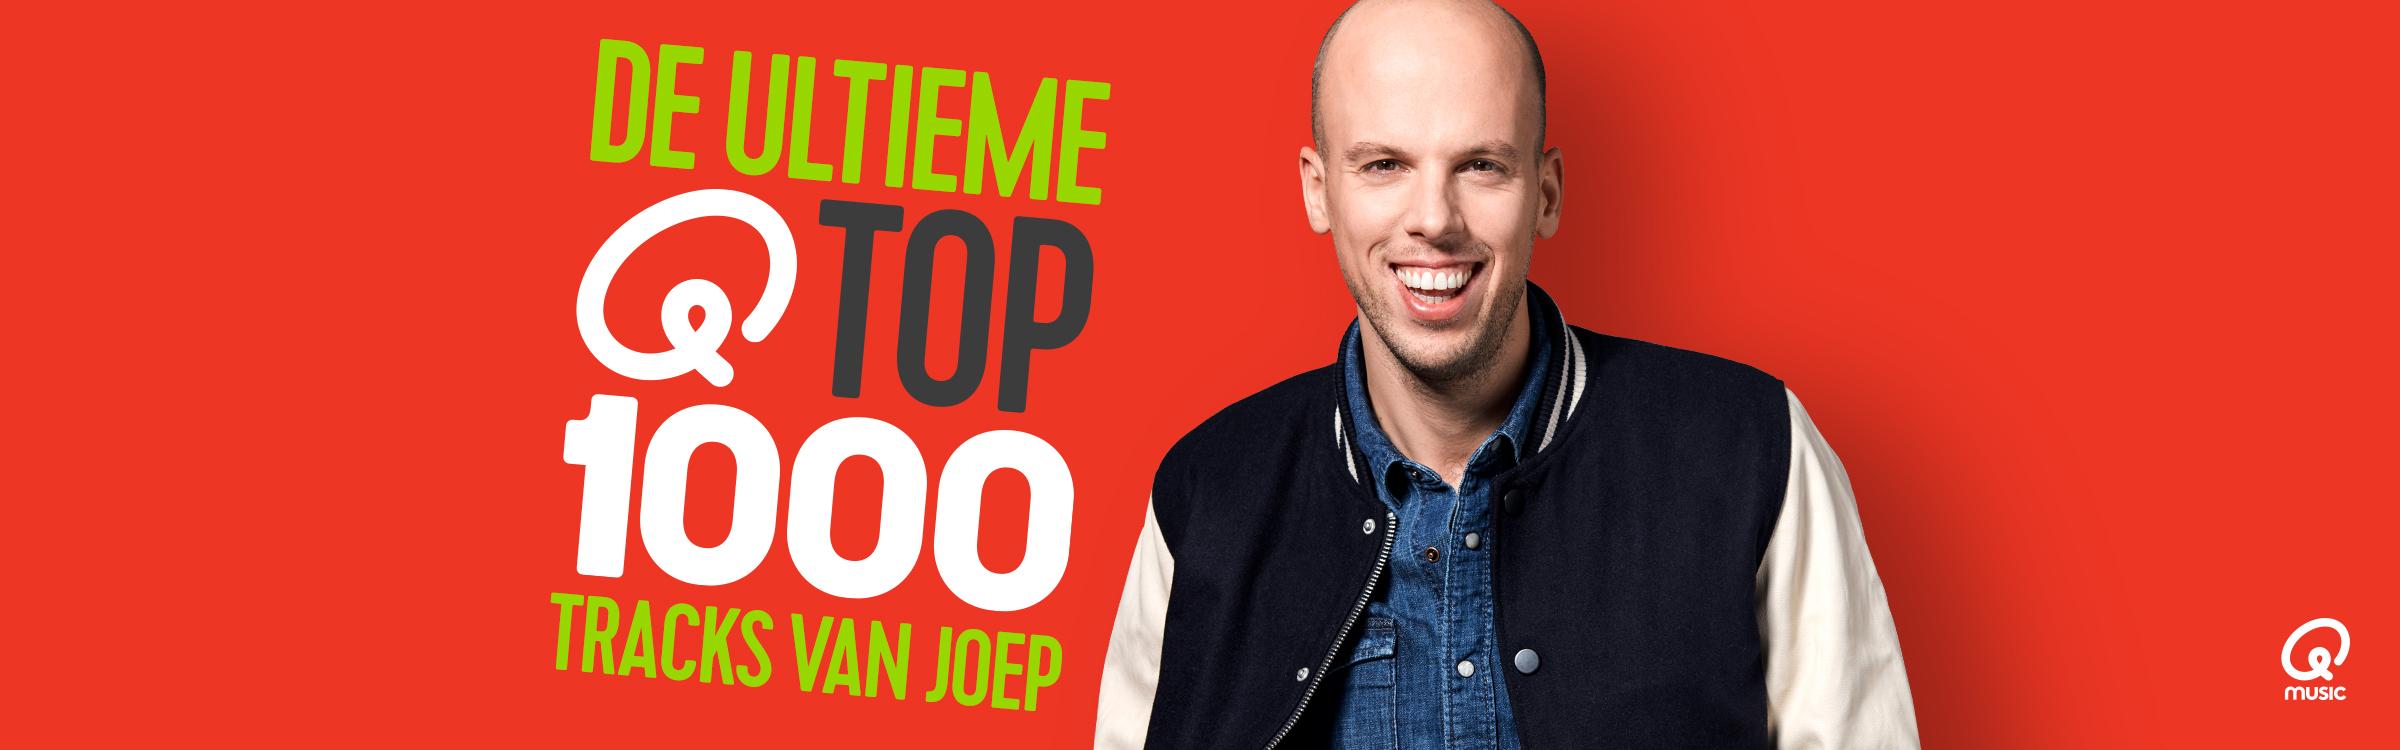 Qmusic actionheader qtop1000 dj joep